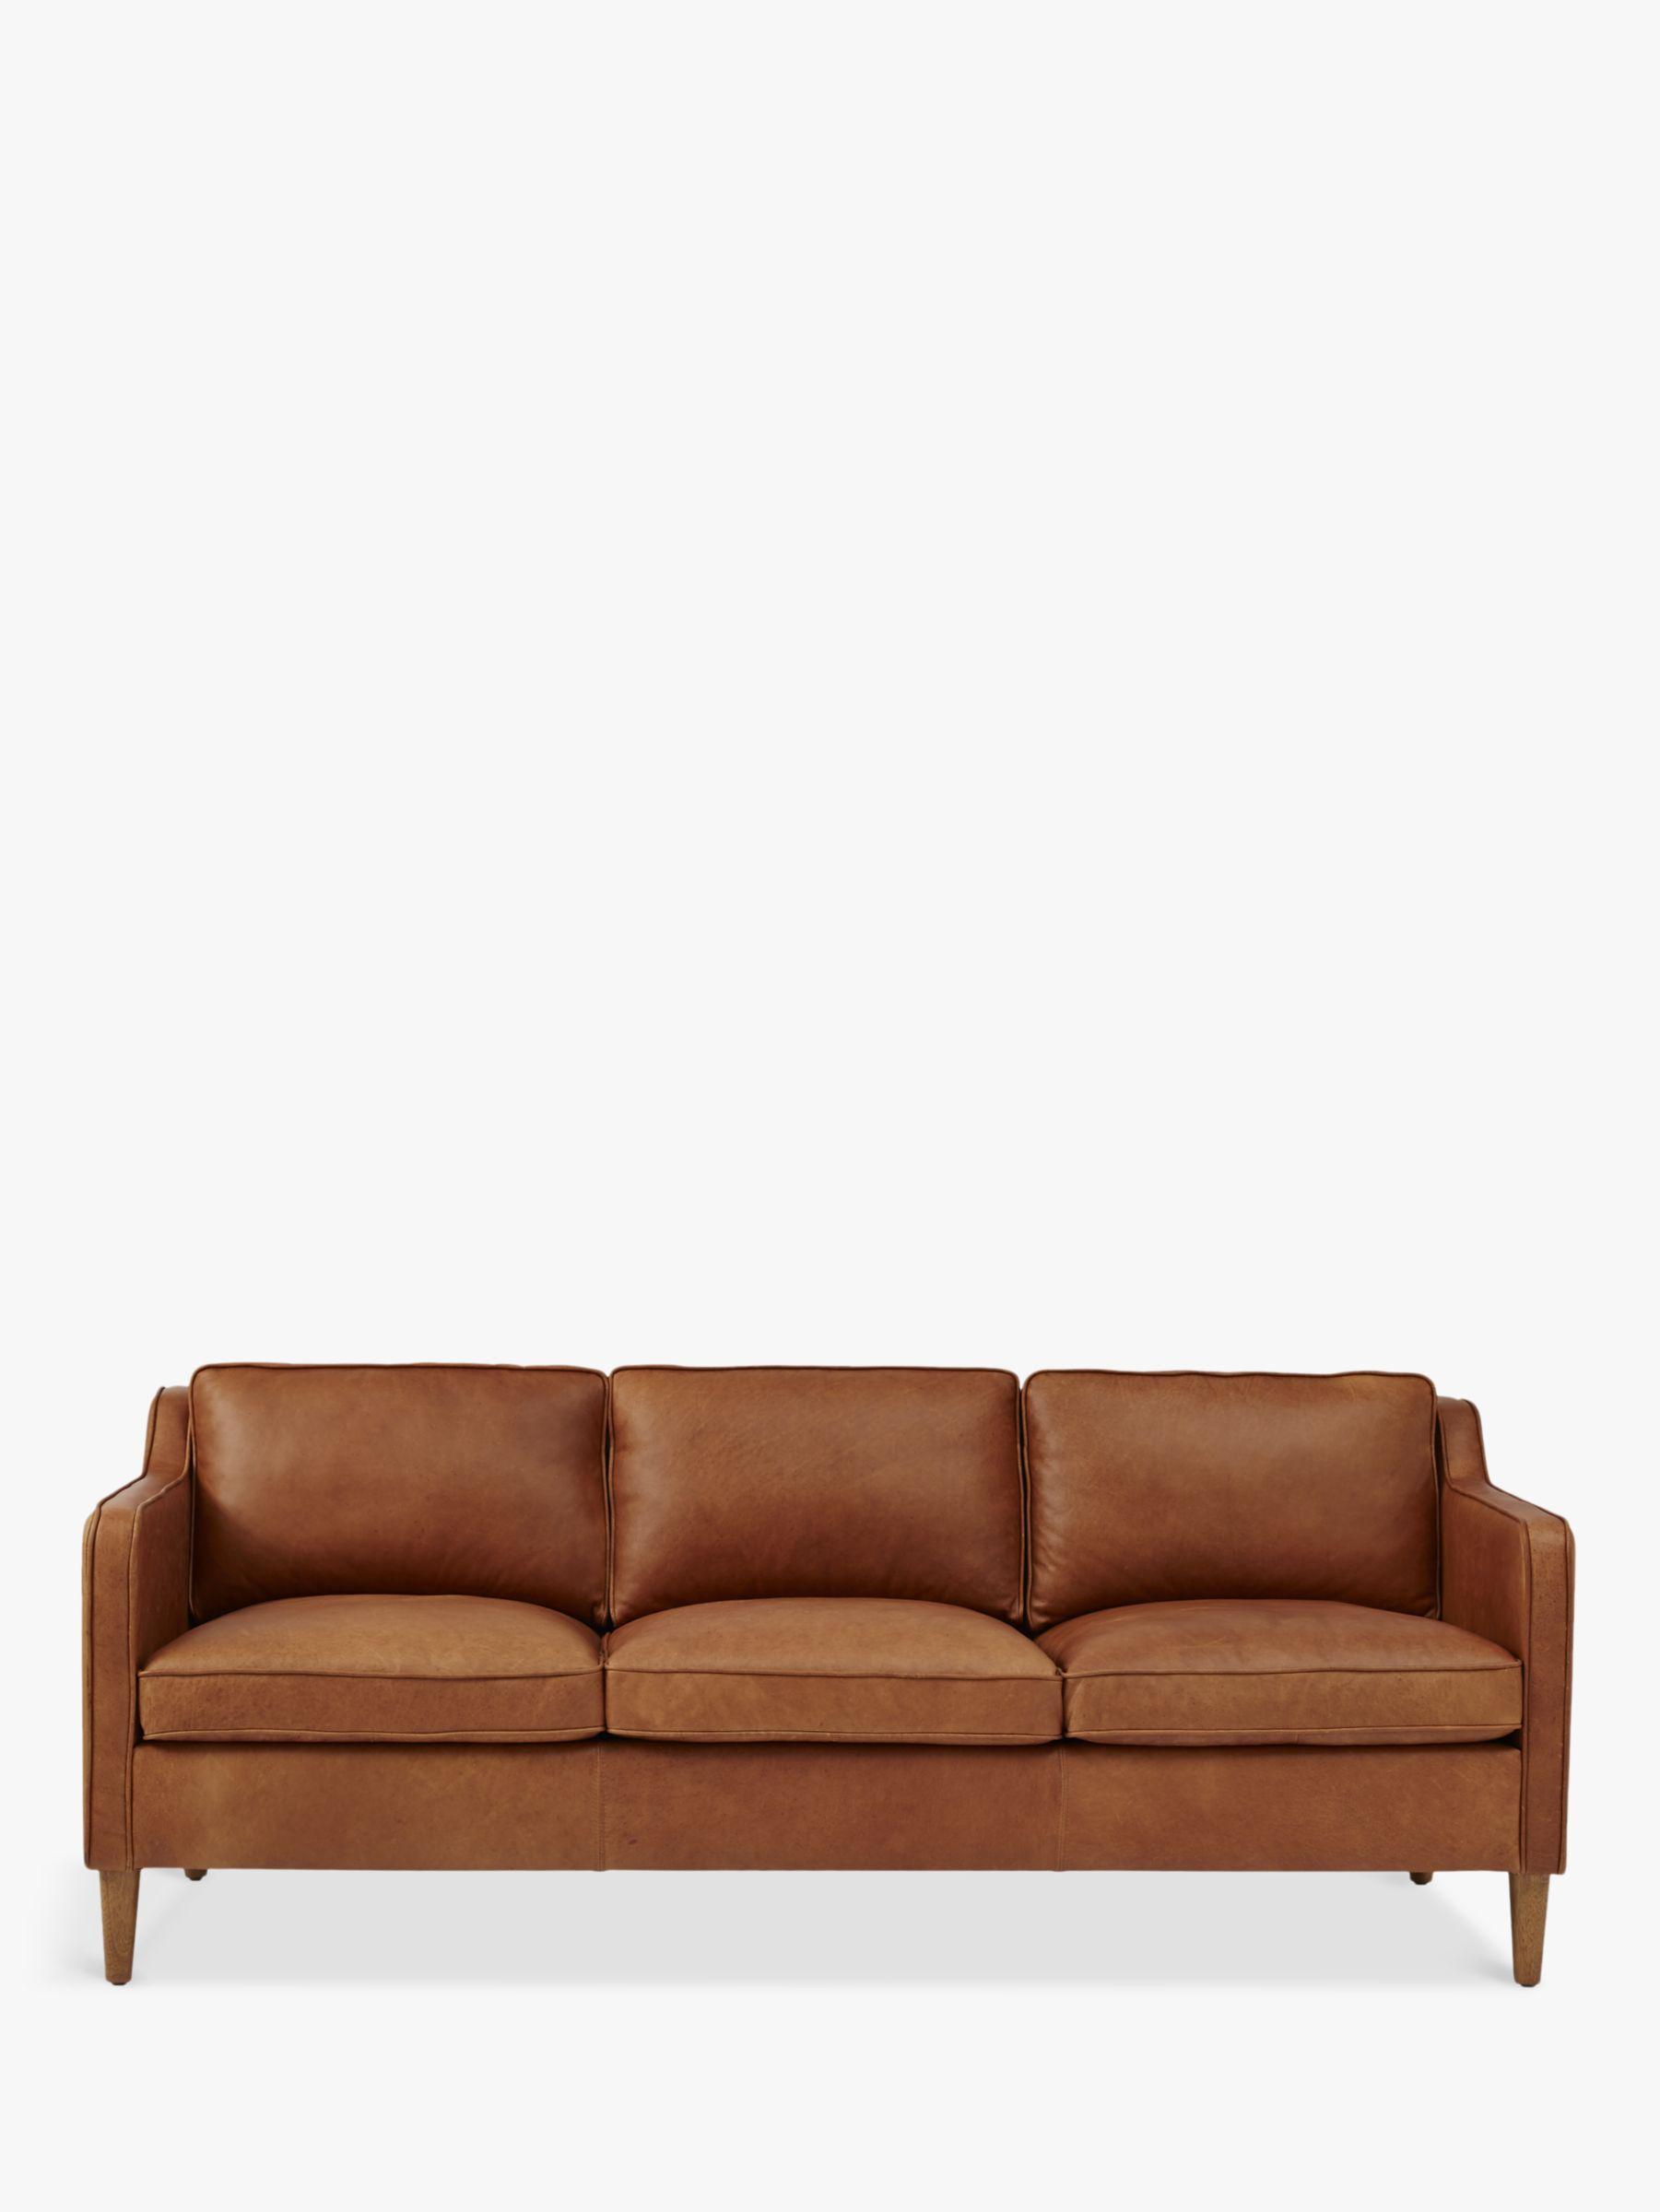 sienna sofa where to buy legs west elm hamilton 3 seater at john lewis partners buywest online johnlewis com